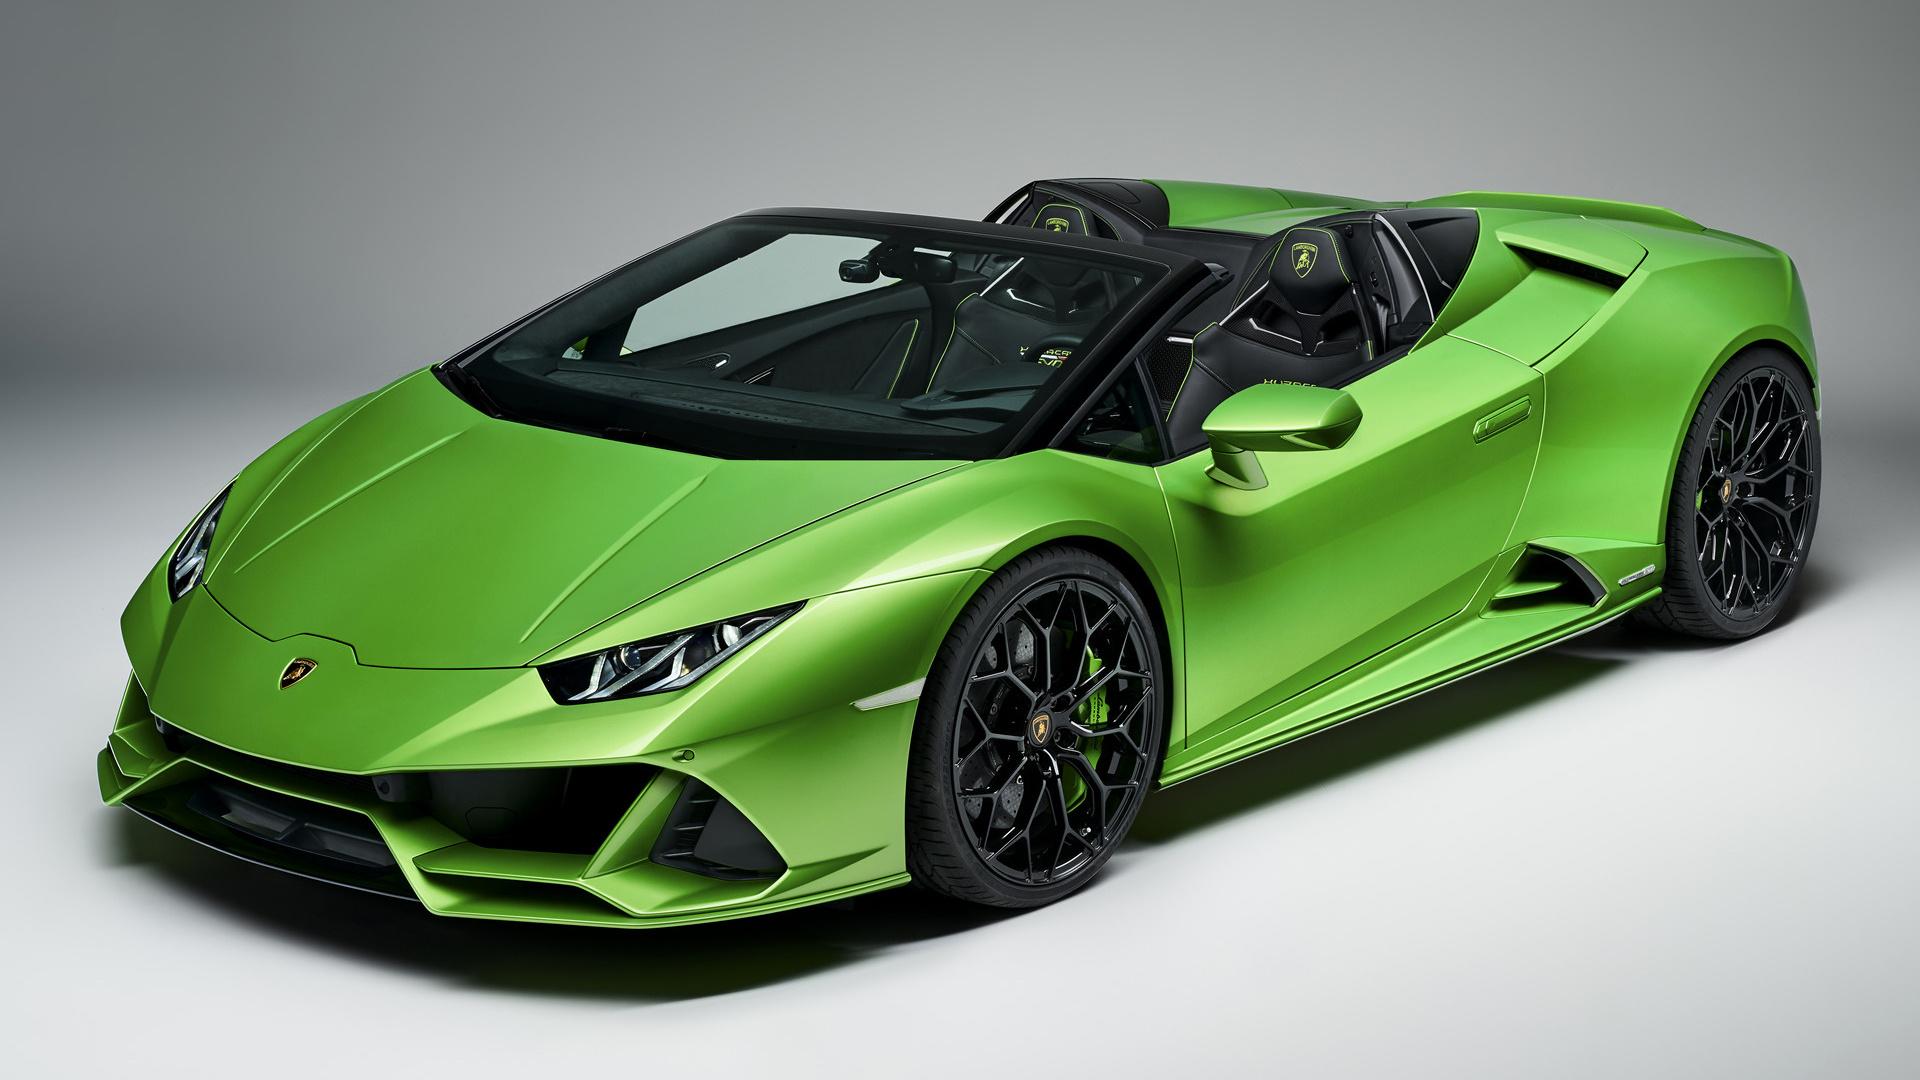 2019 Lamborghini Huracan Evo Spyder - Wallpapers and HD ...